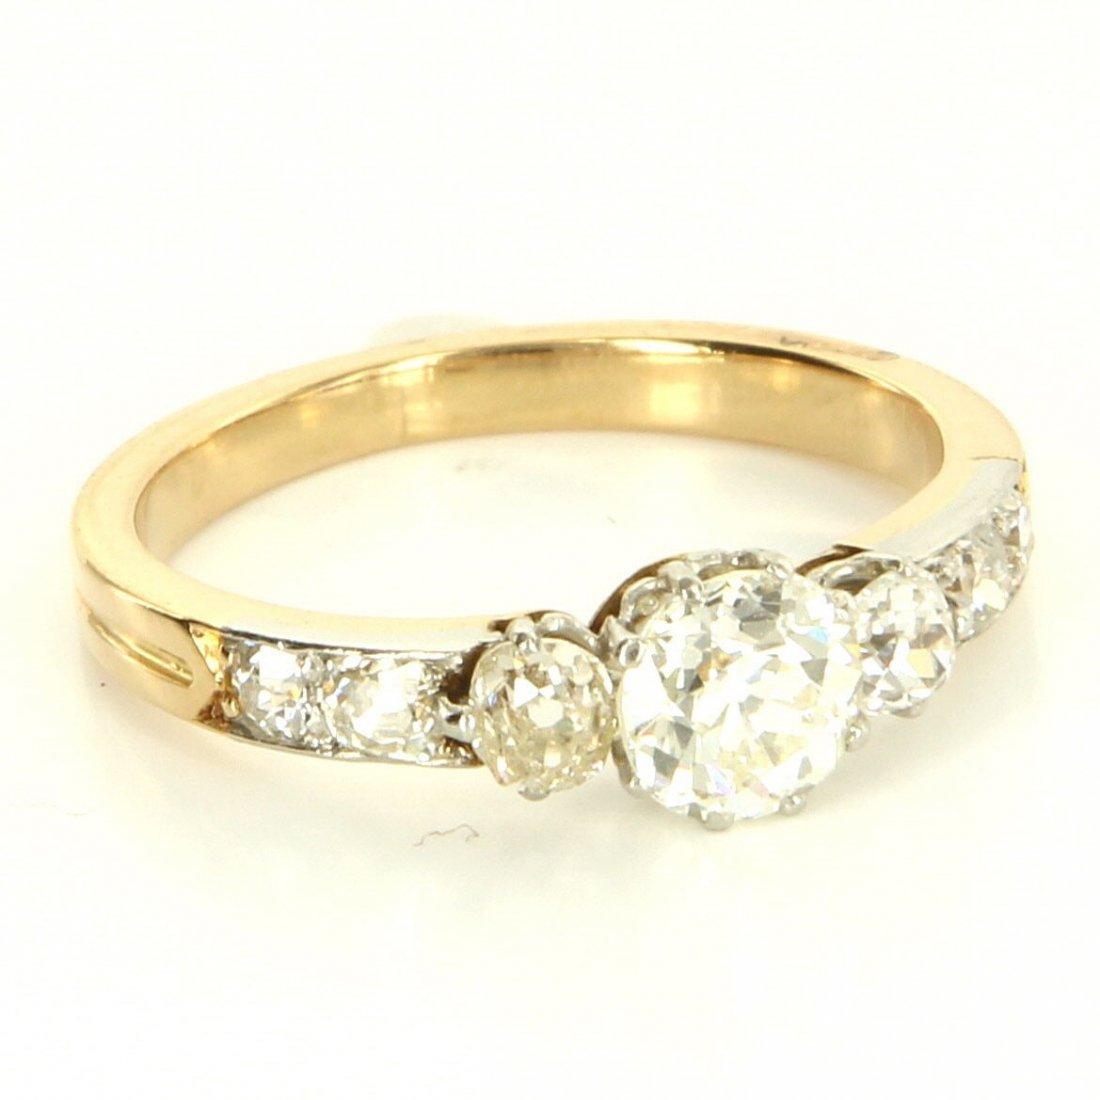 Antique Art Deco 18 Karat Yellow Gold Platinum Diamond